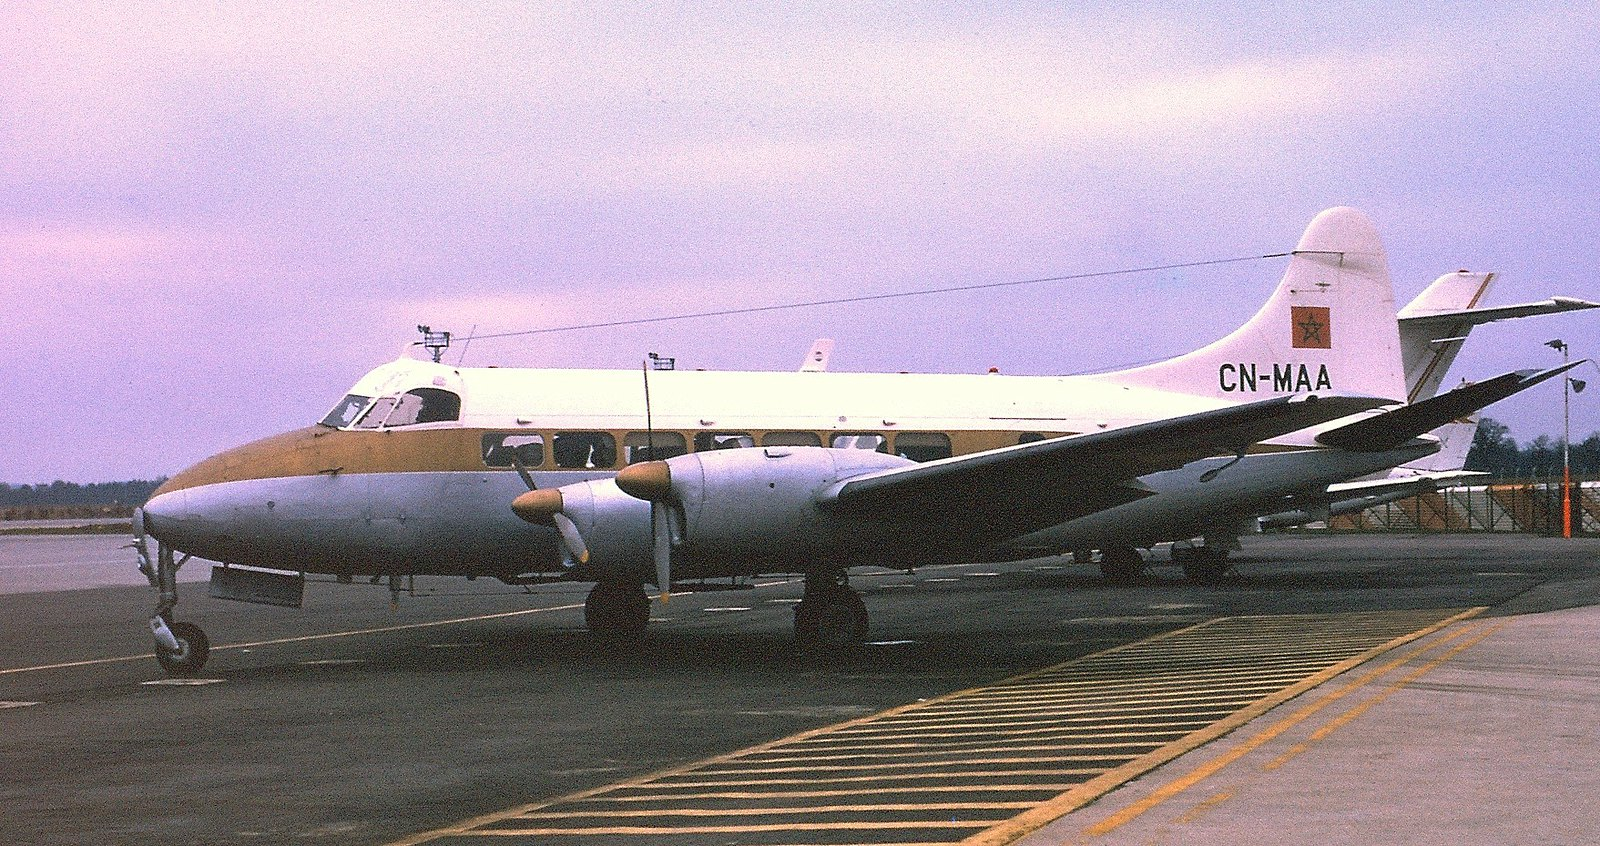 FRA: Photos anciens avions des FRA - Page 12 48413293586_fa9dec00f3_h